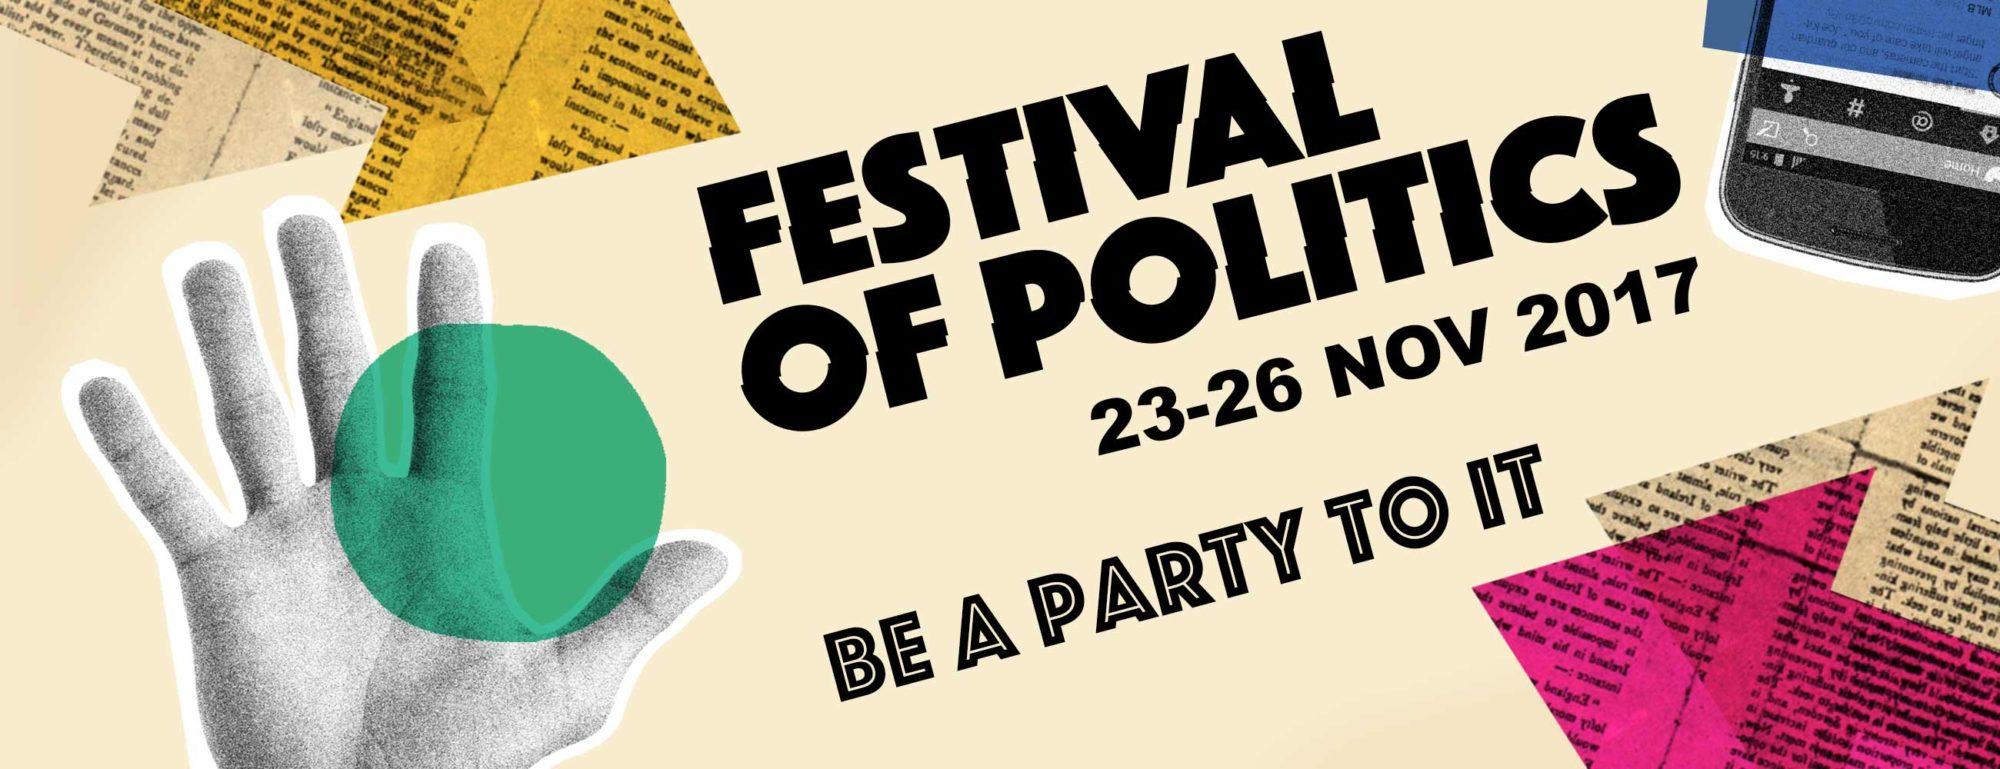 Festival of Politics 2017